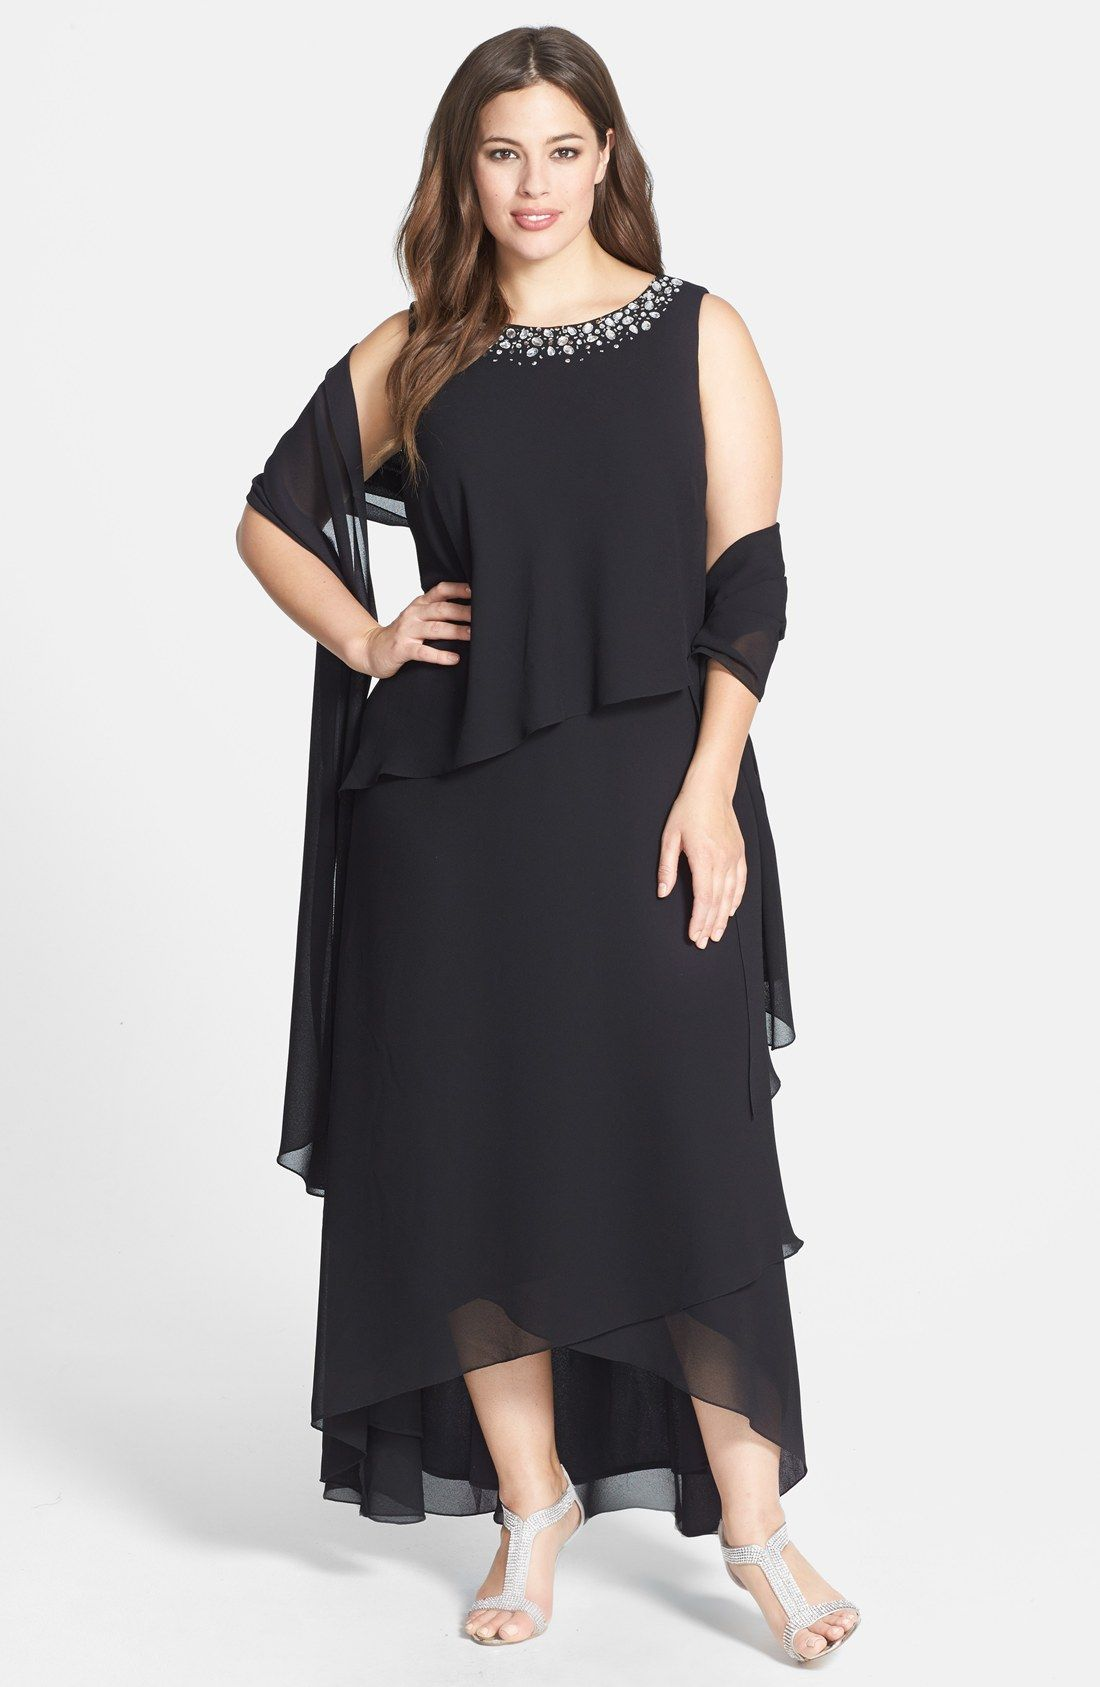 Nordstrom Womens Plus Size Evening Dresses